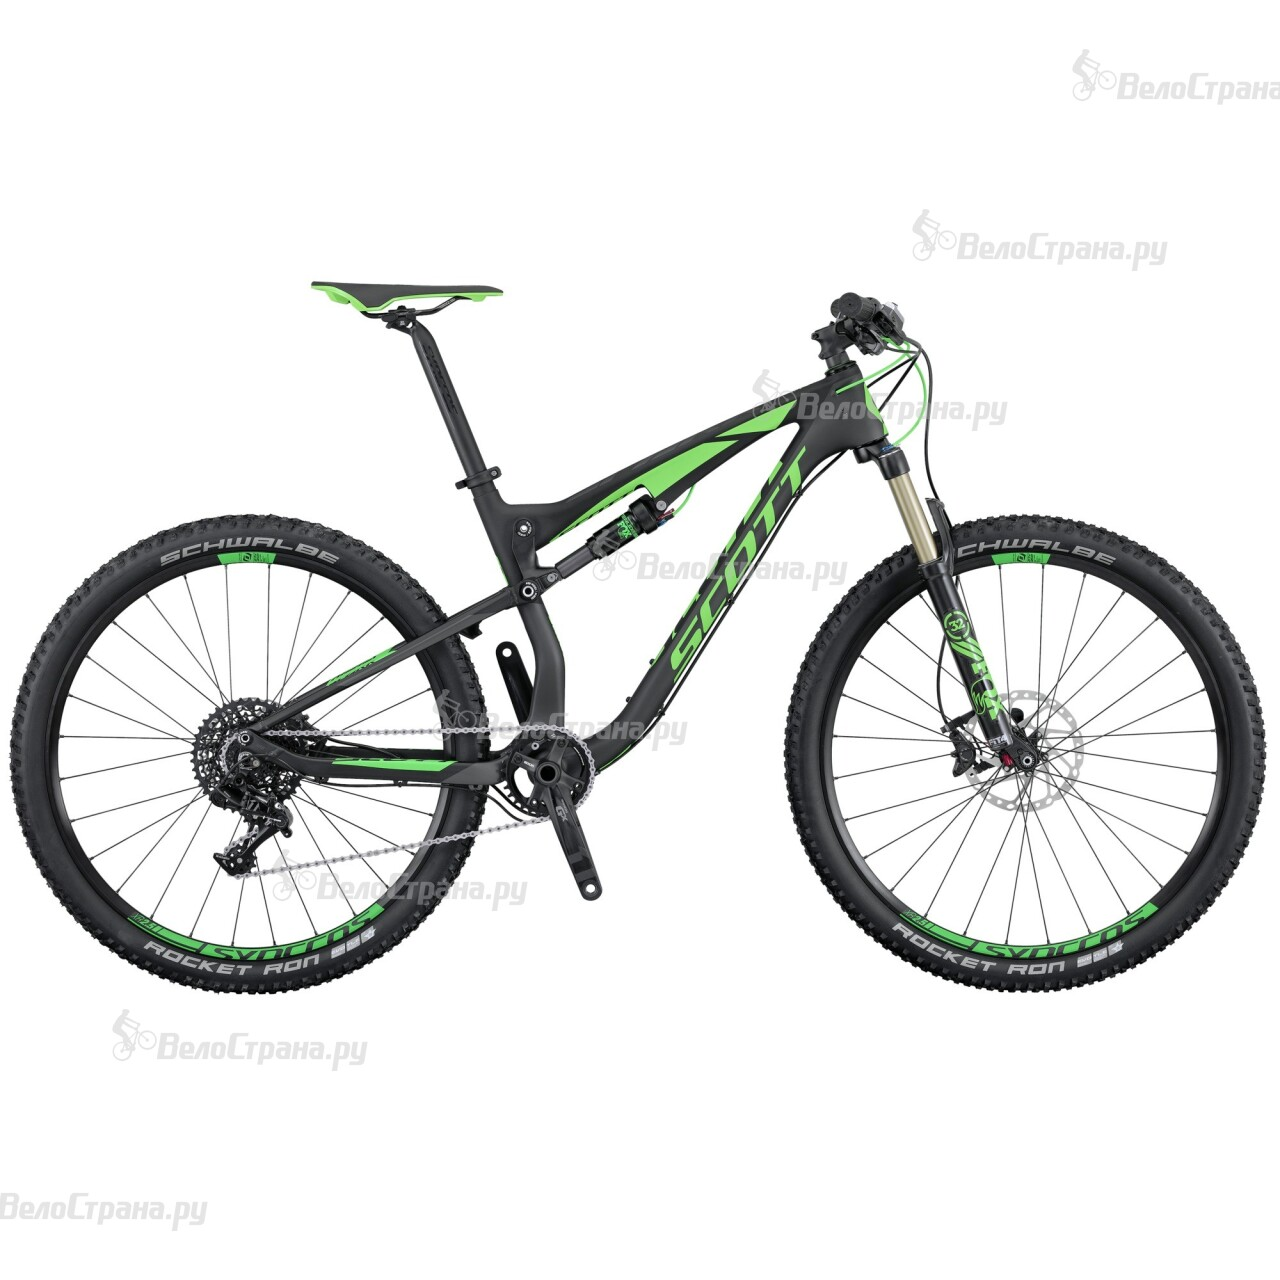 Велосипед Scott Spark 720 (2016) велосипед scott spark 720 2015